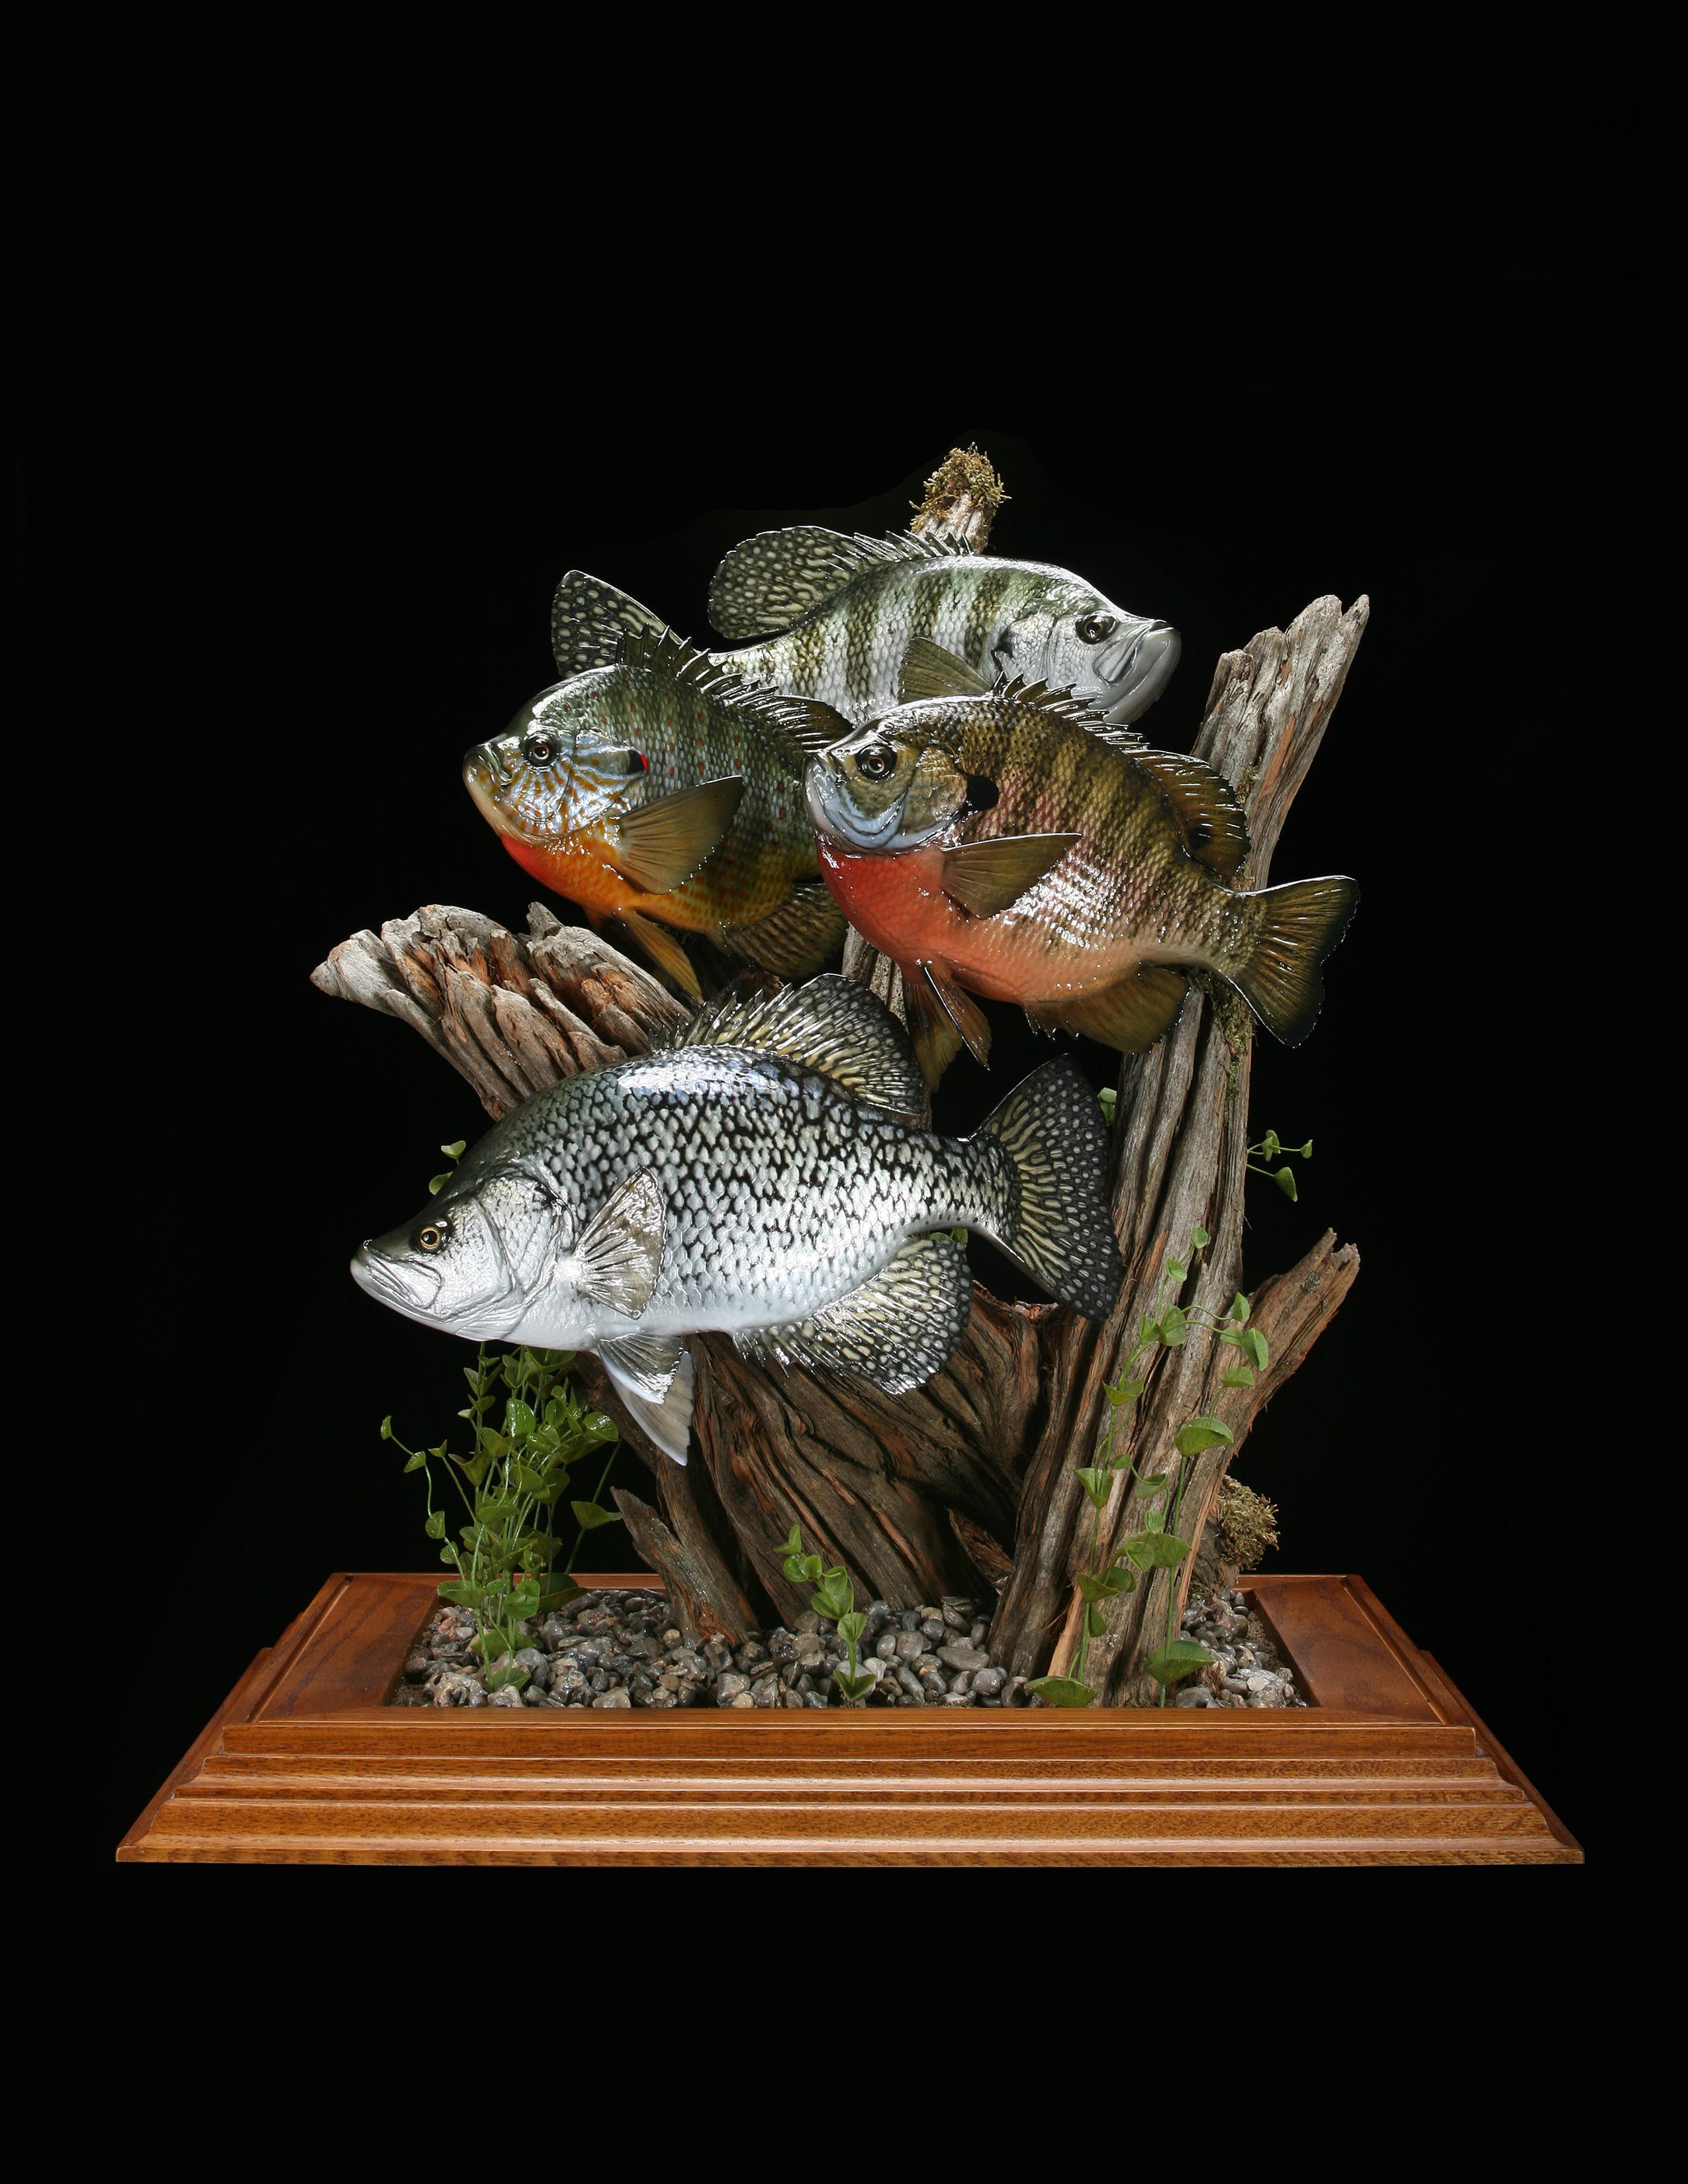 Pumpkinseed Sunfish, Blugill, Black Crappie